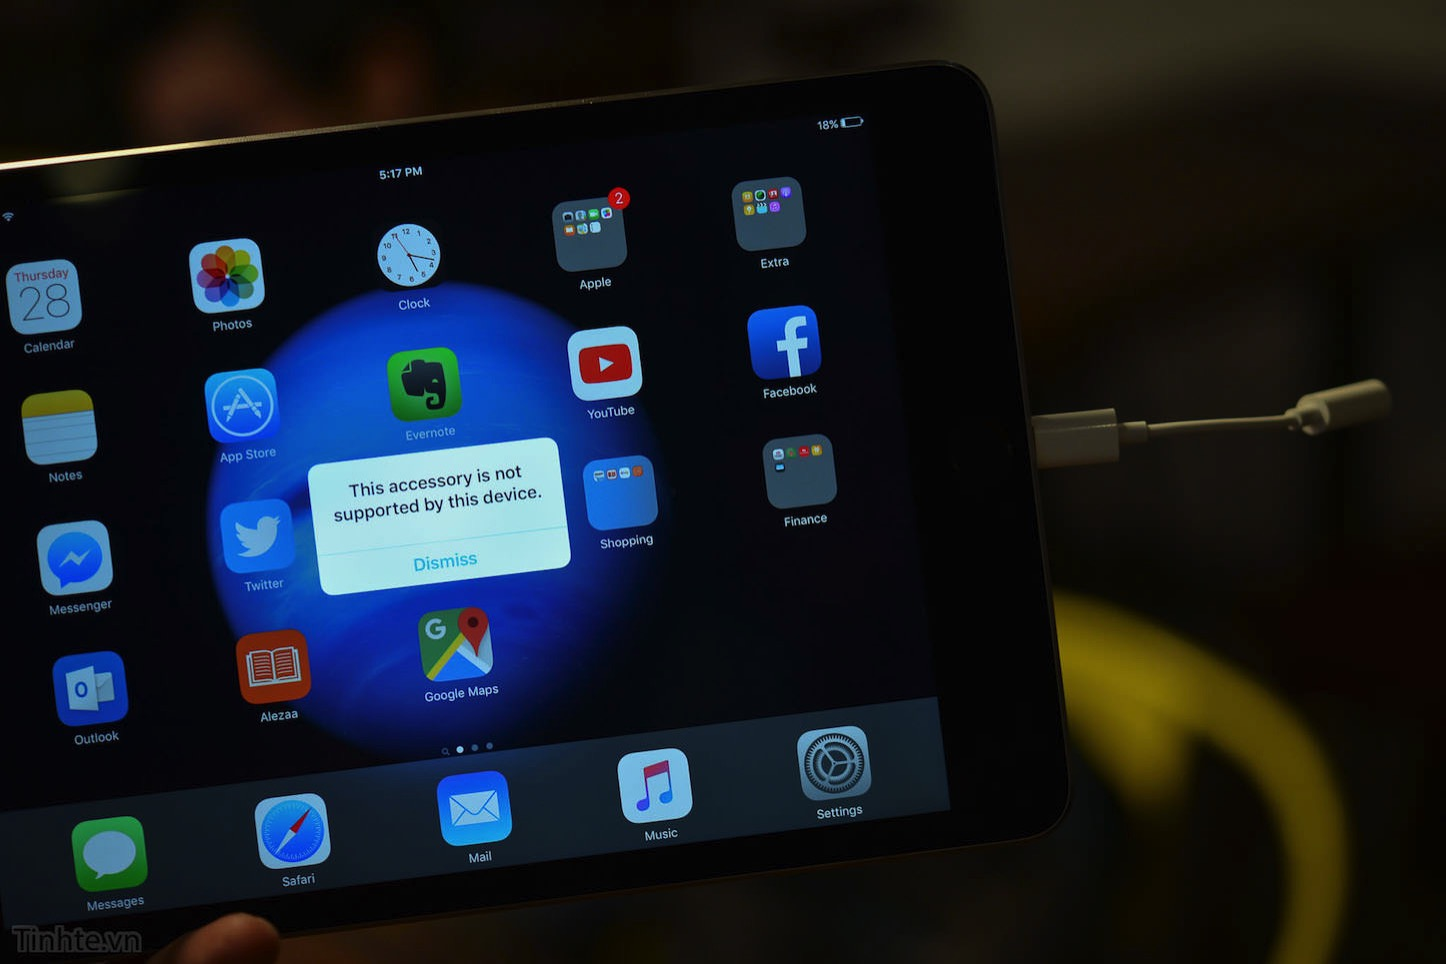 iPhone-7-lightning-to-3.5mm-4.jpg